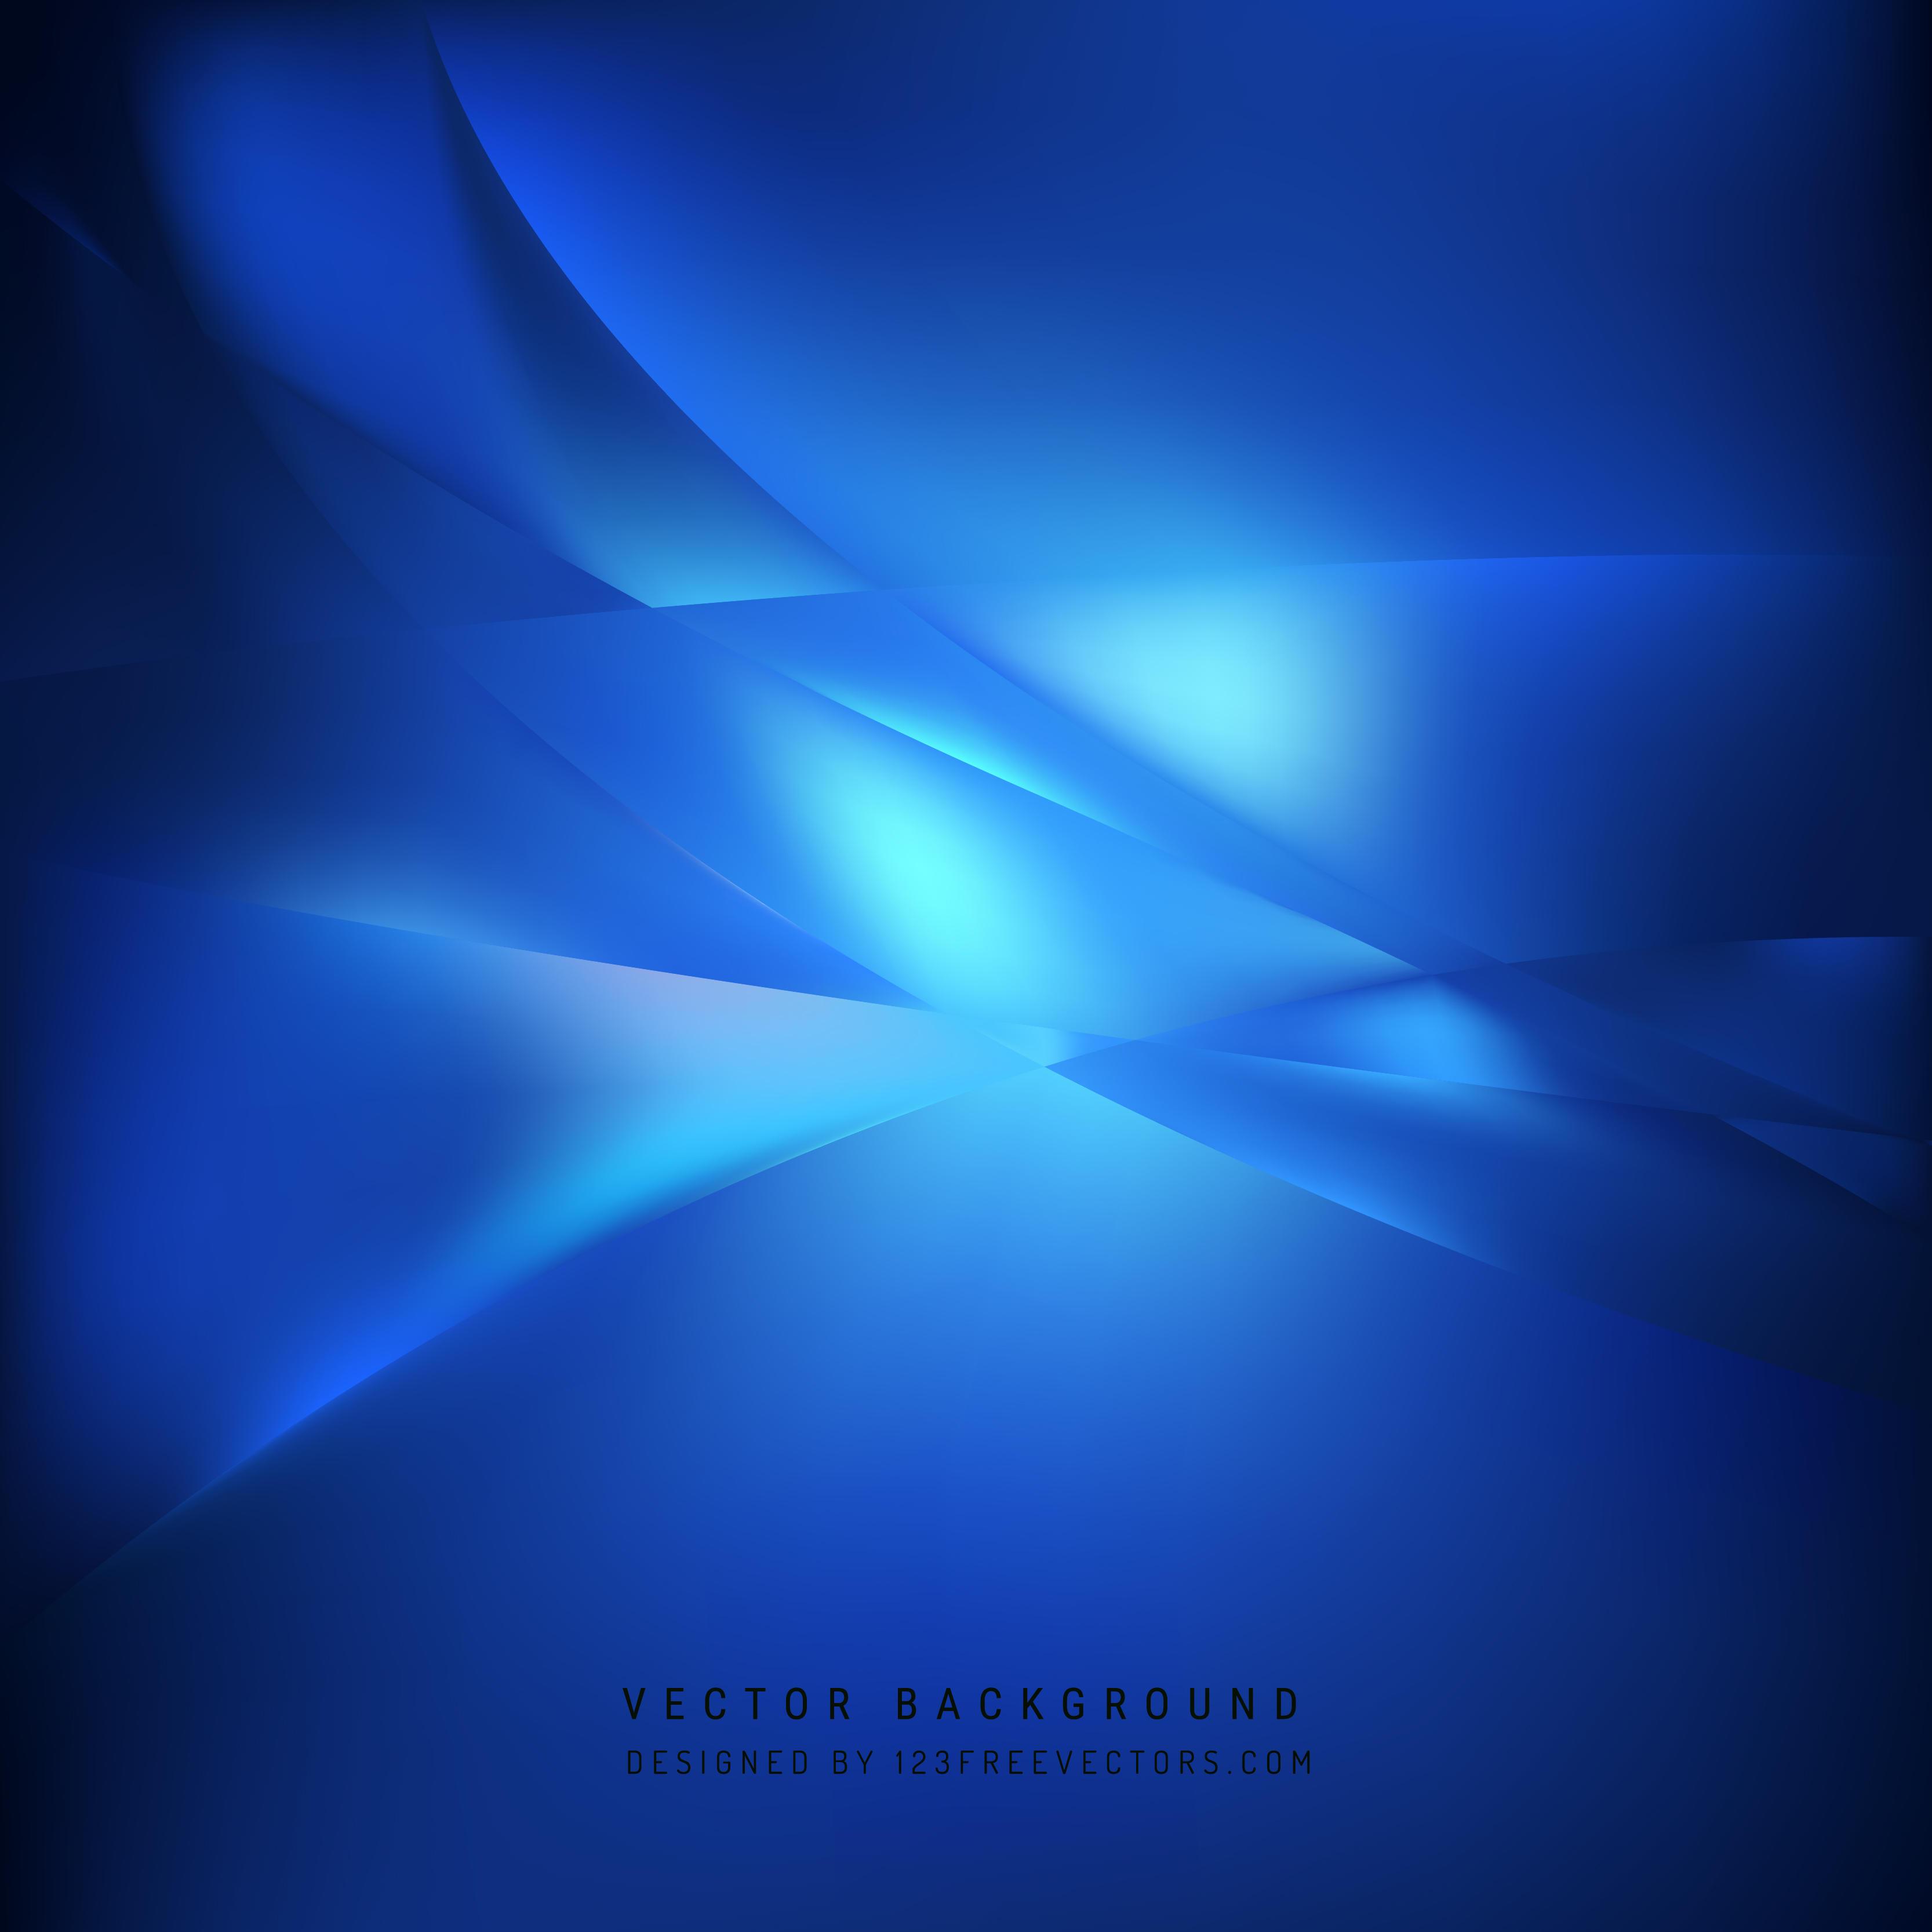 Navy Blue Background